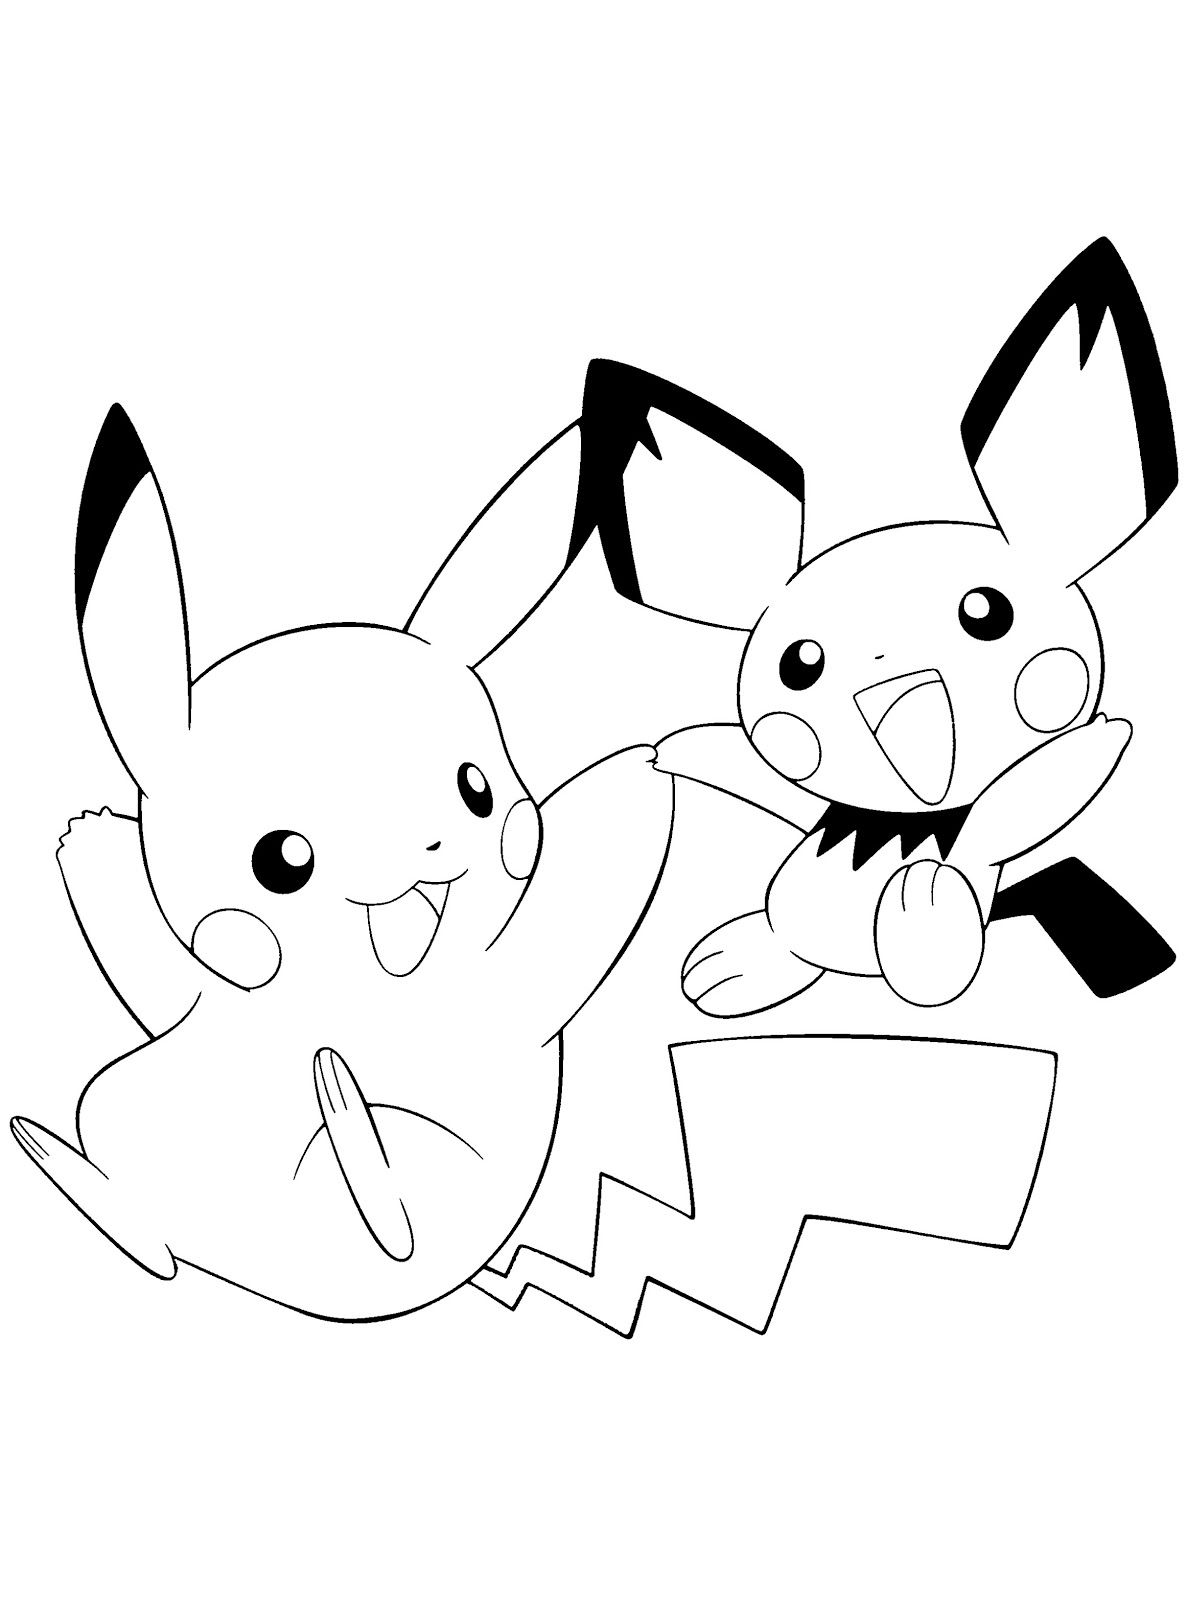 Best Printable Pikachu And Pichu Coloring Books Warna Gambar